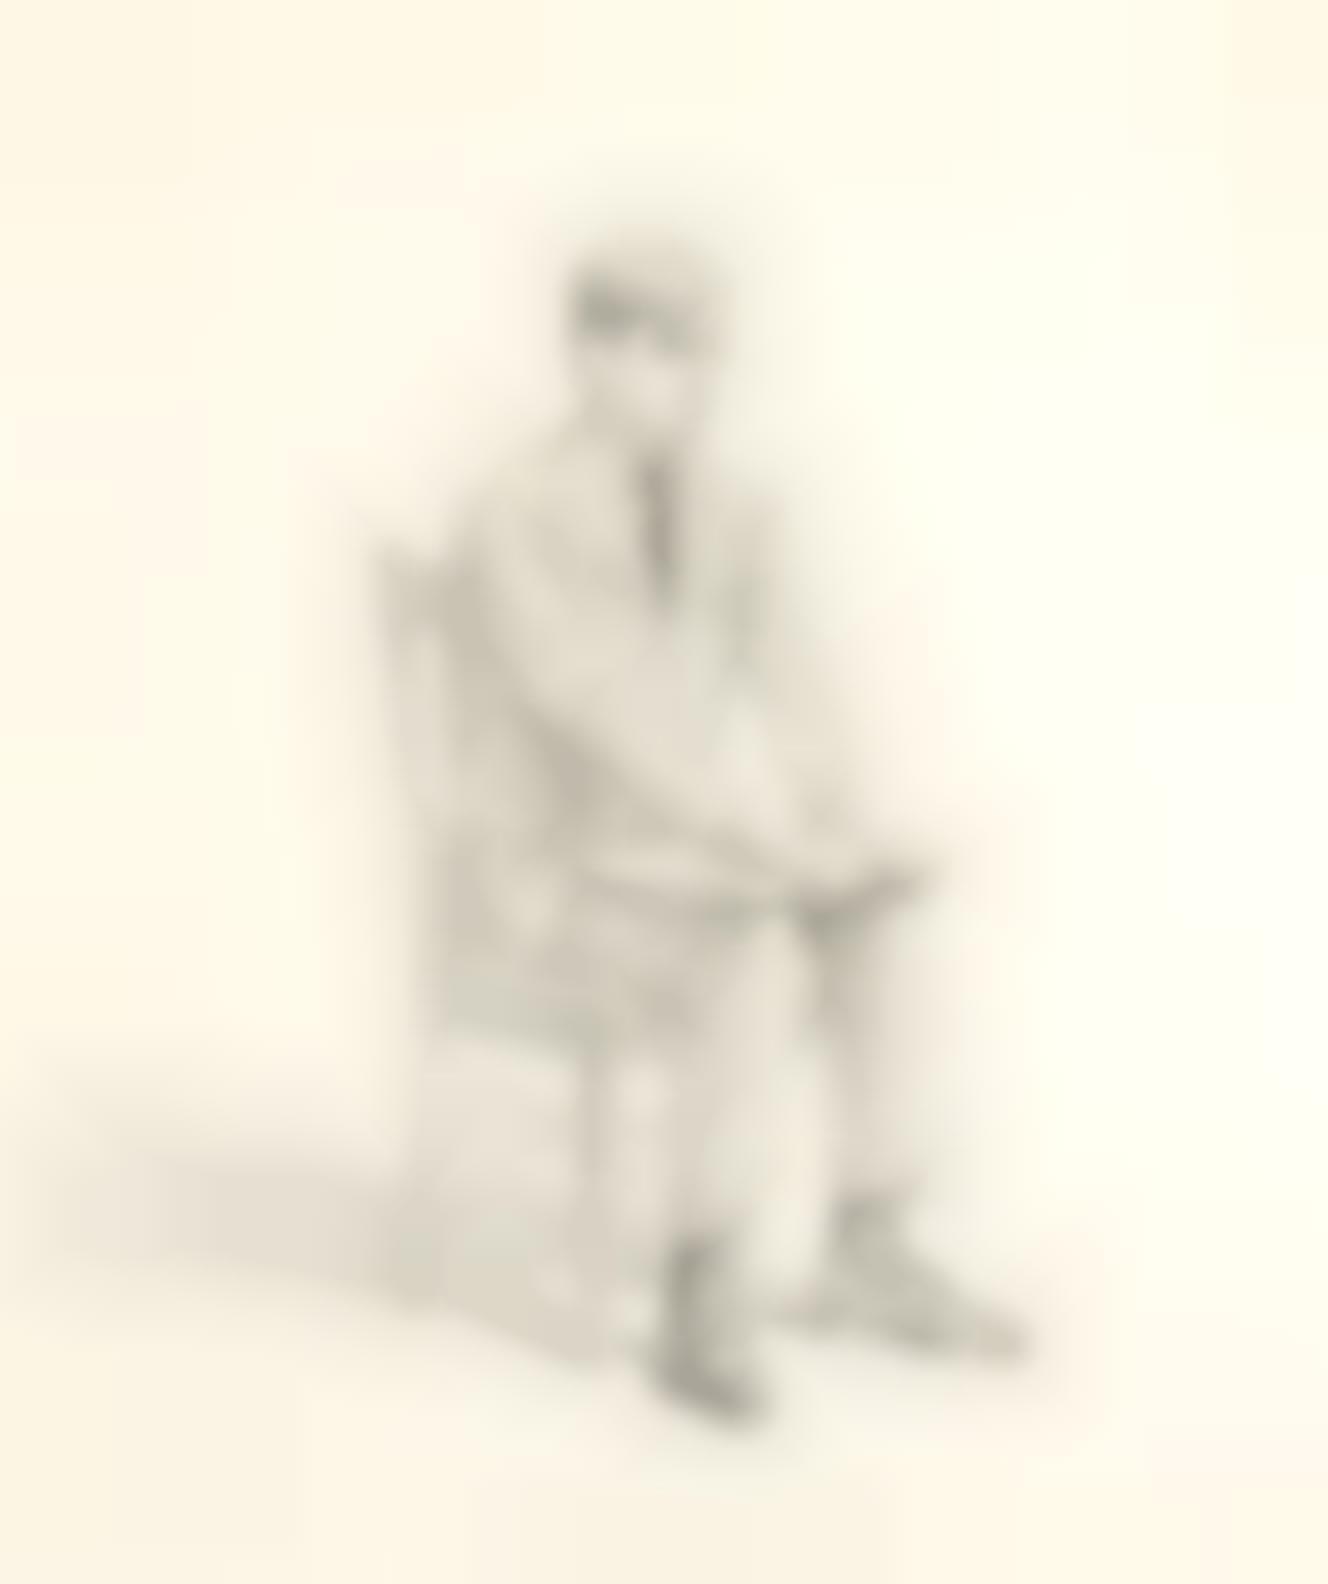 Wayne Thiebaud-Portrait Of Bill Ittman-1966